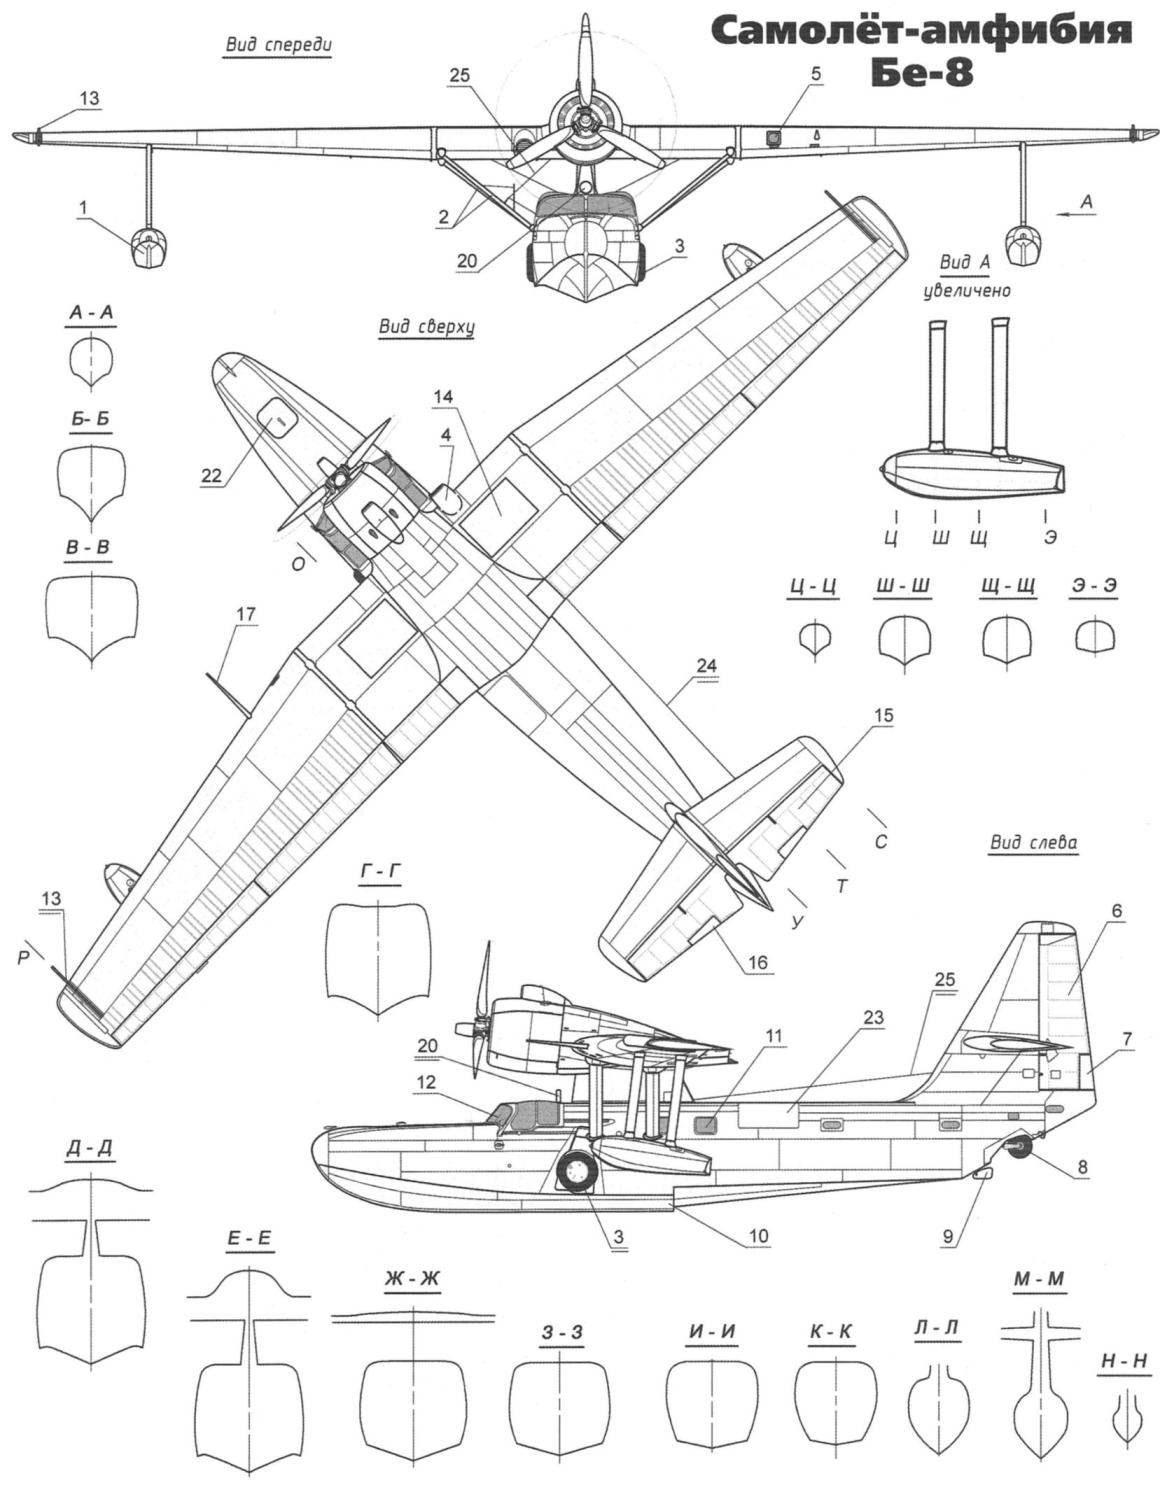 Amphibian aircraft Be-8